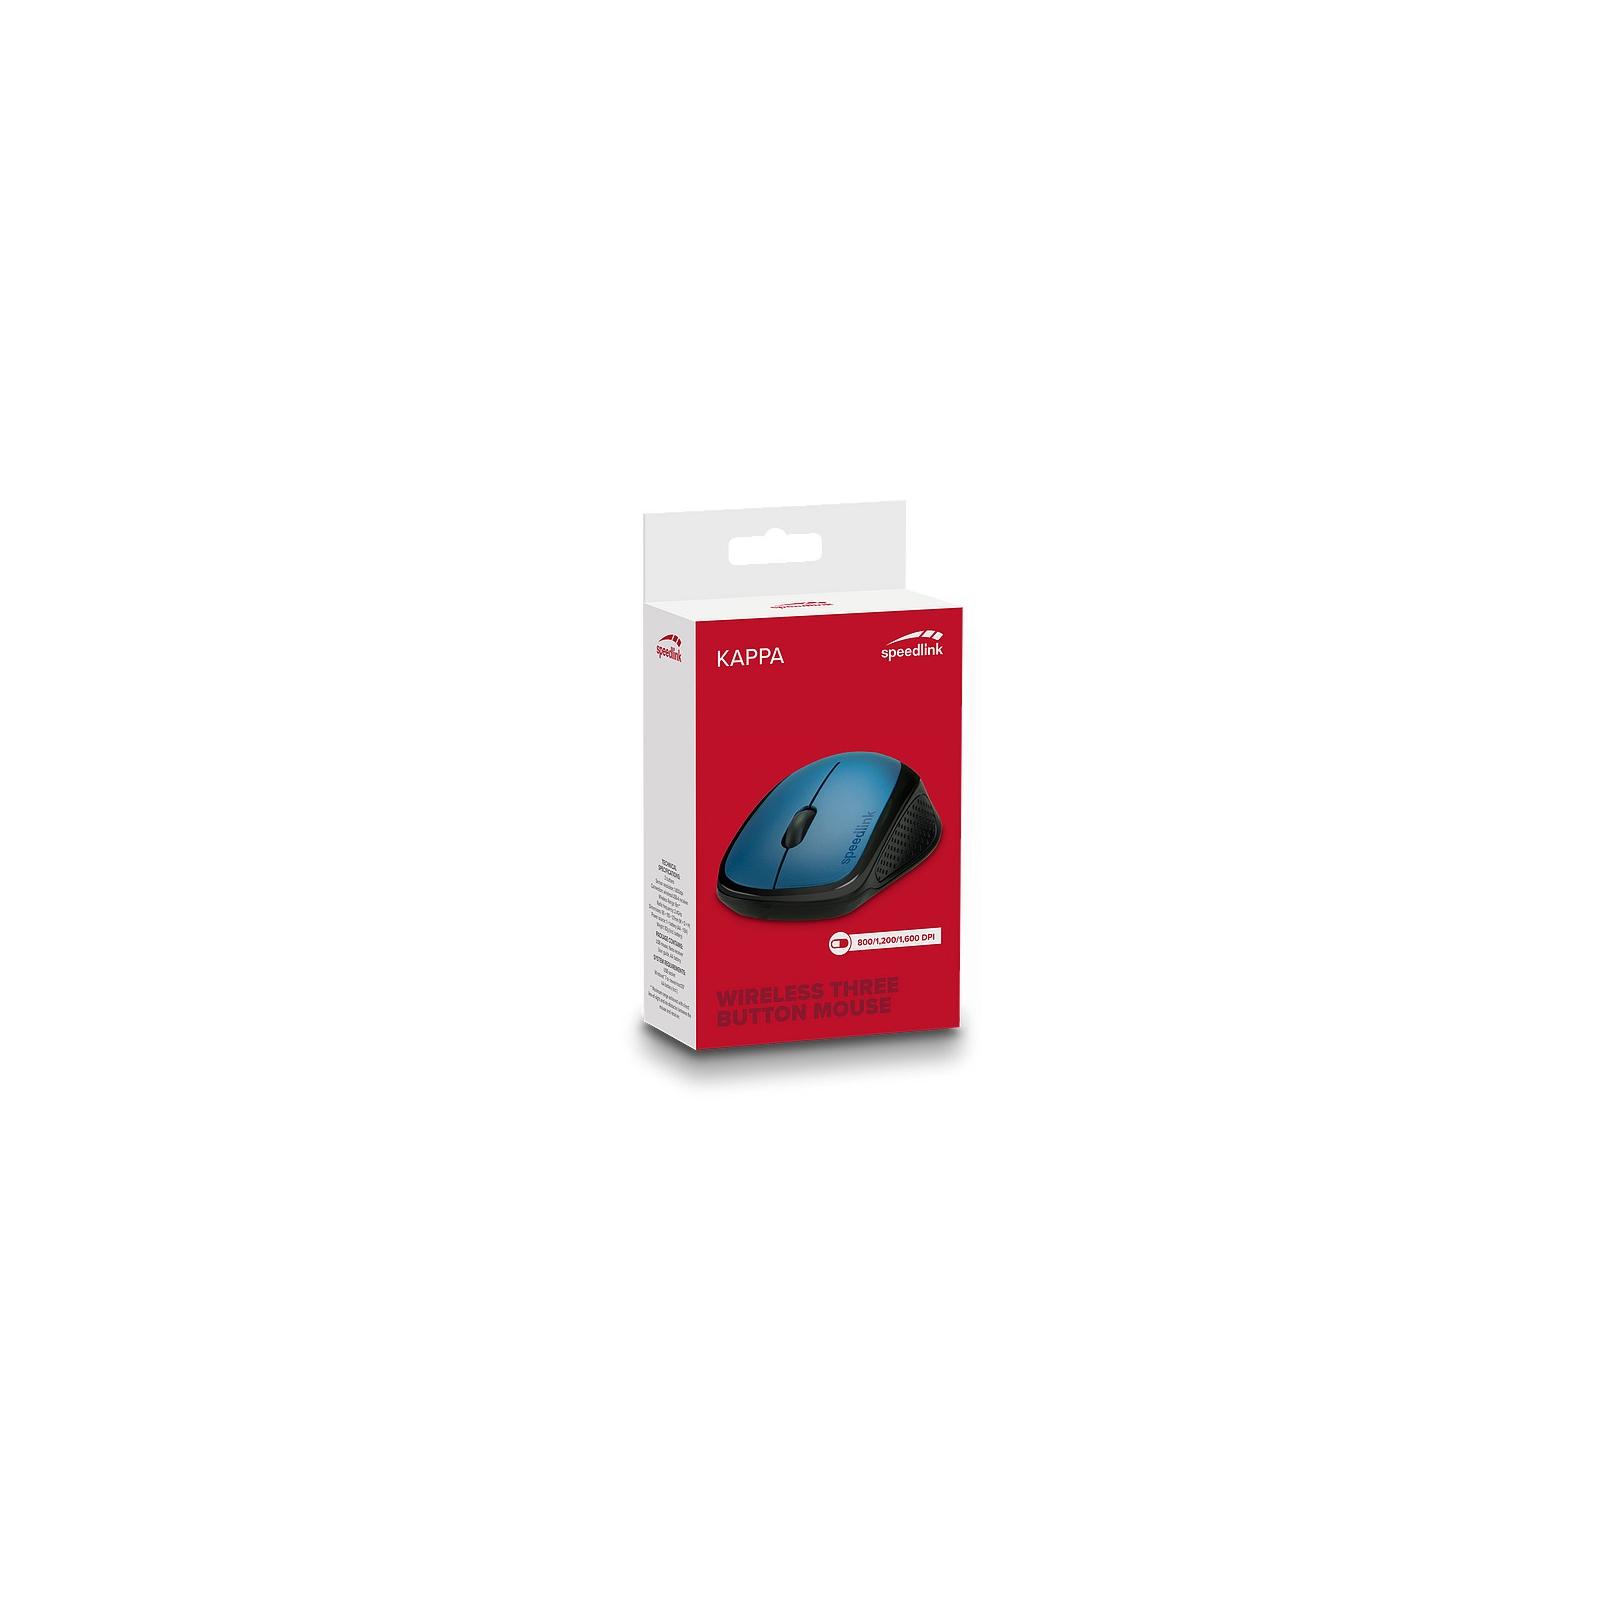 Мышка Speedlink Kappa Wireless Black (SL-630011-BK) изображение 3